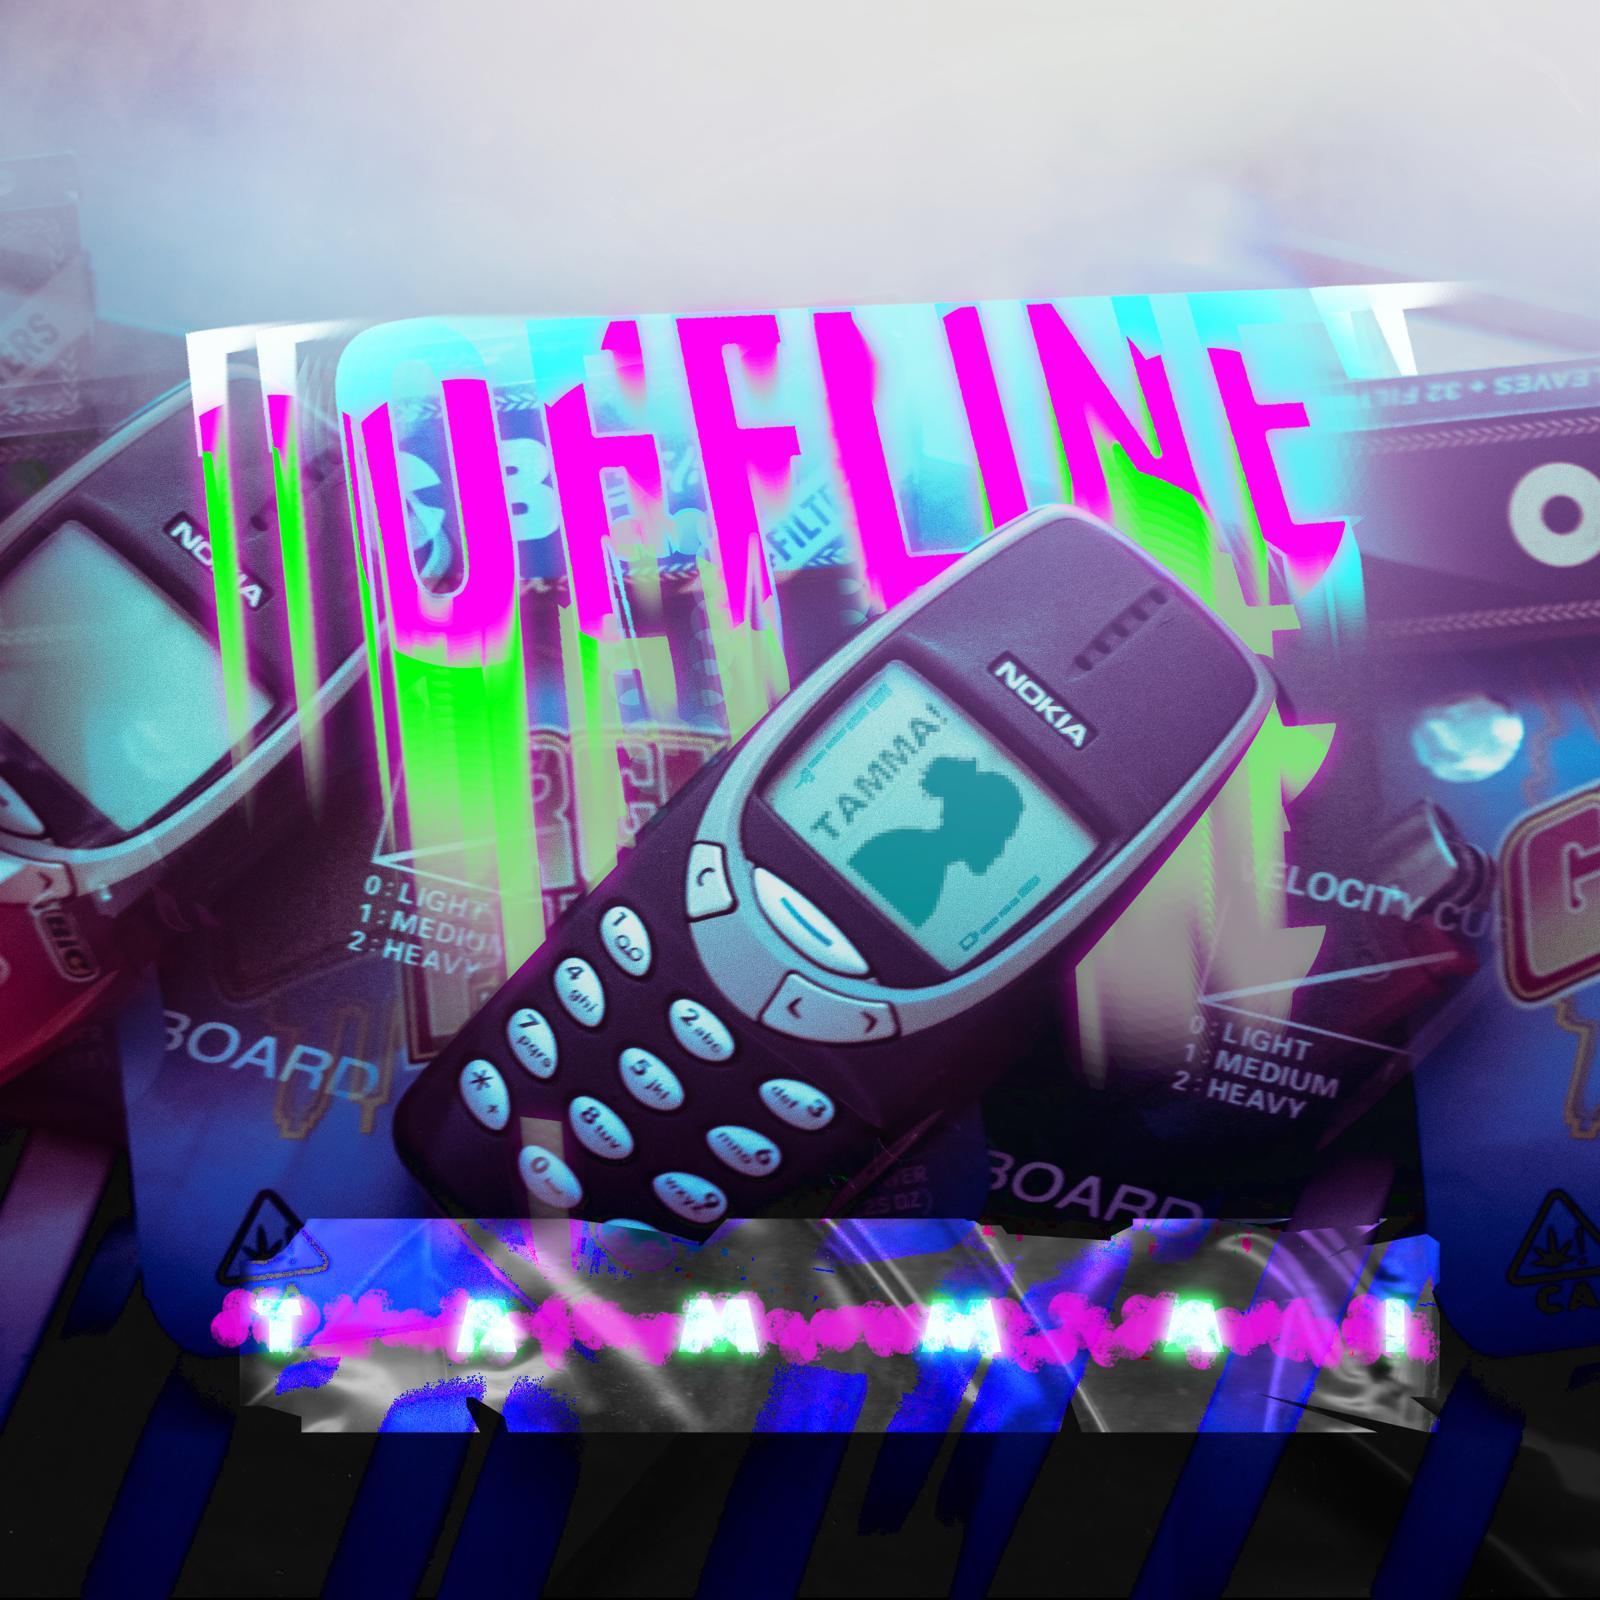 Upcoming: TAMMA! - Offline